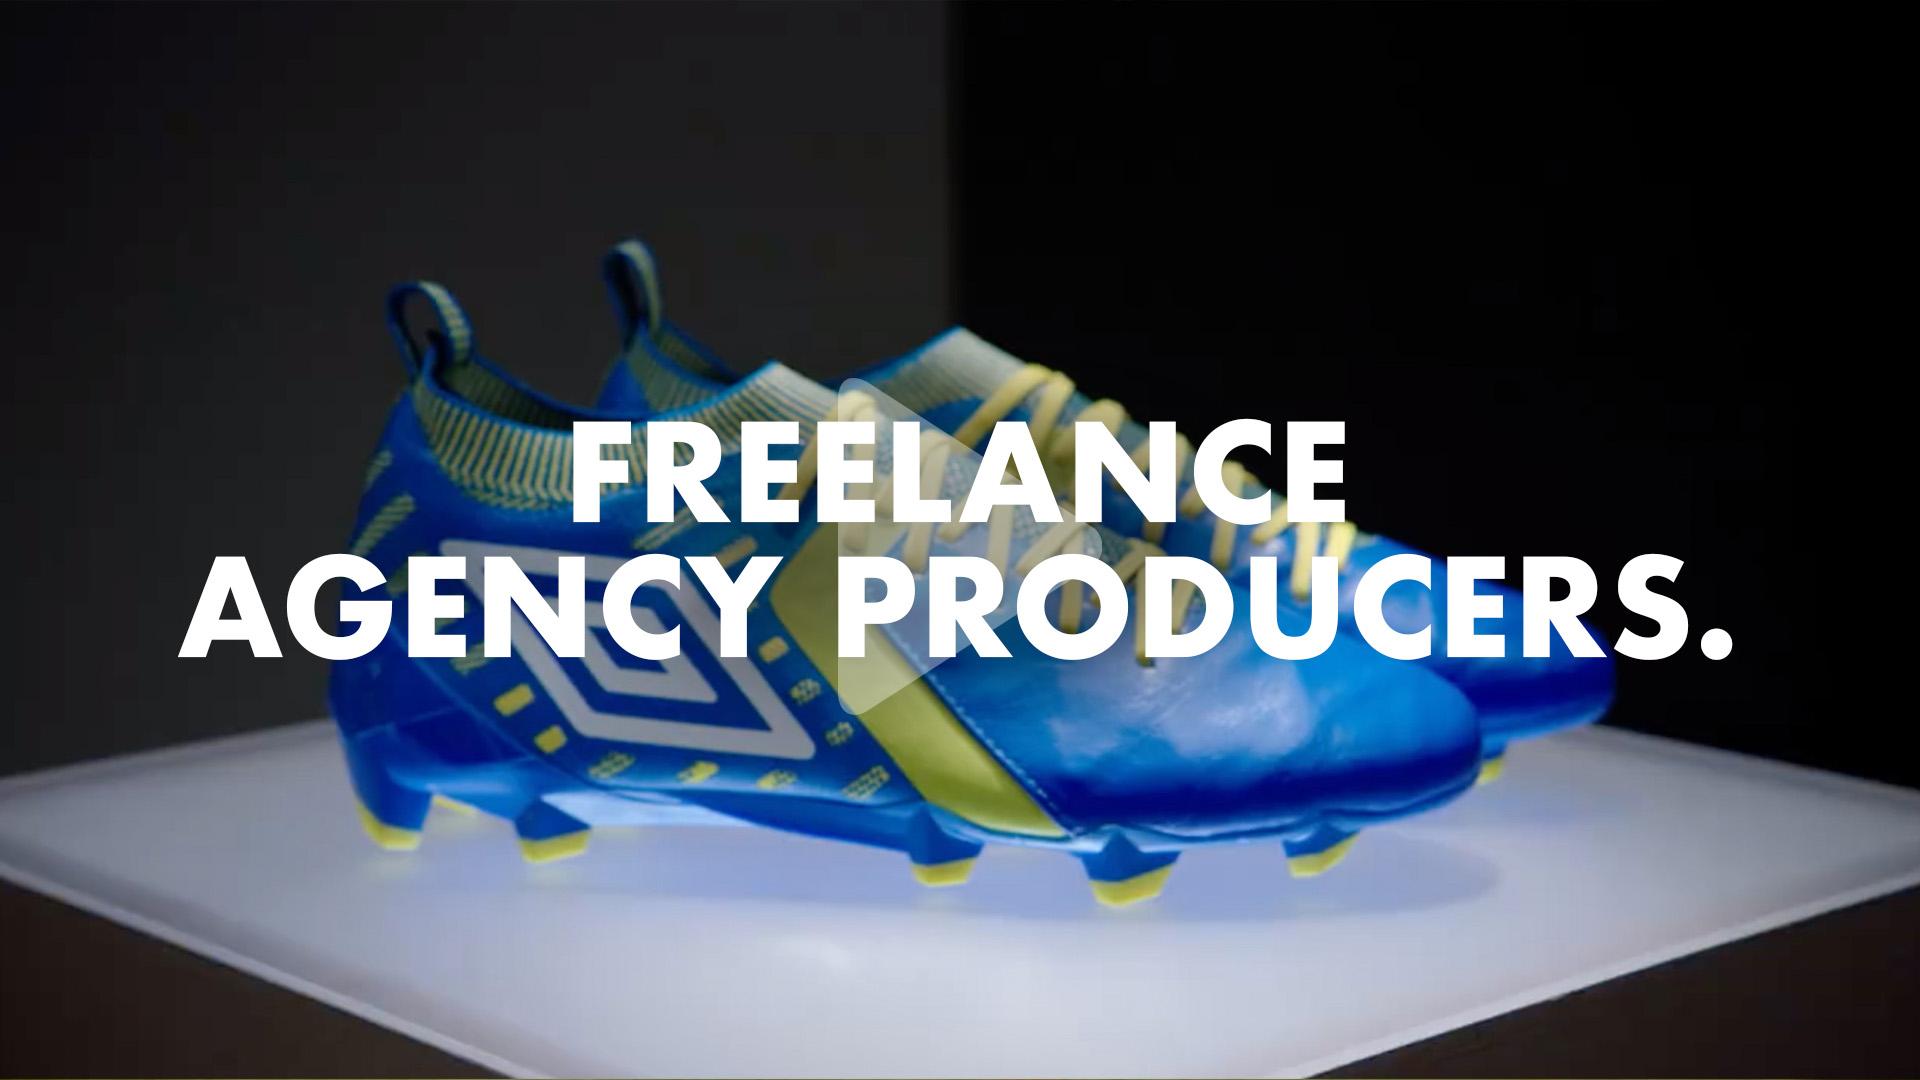 Freelance Agency Producer.jpg